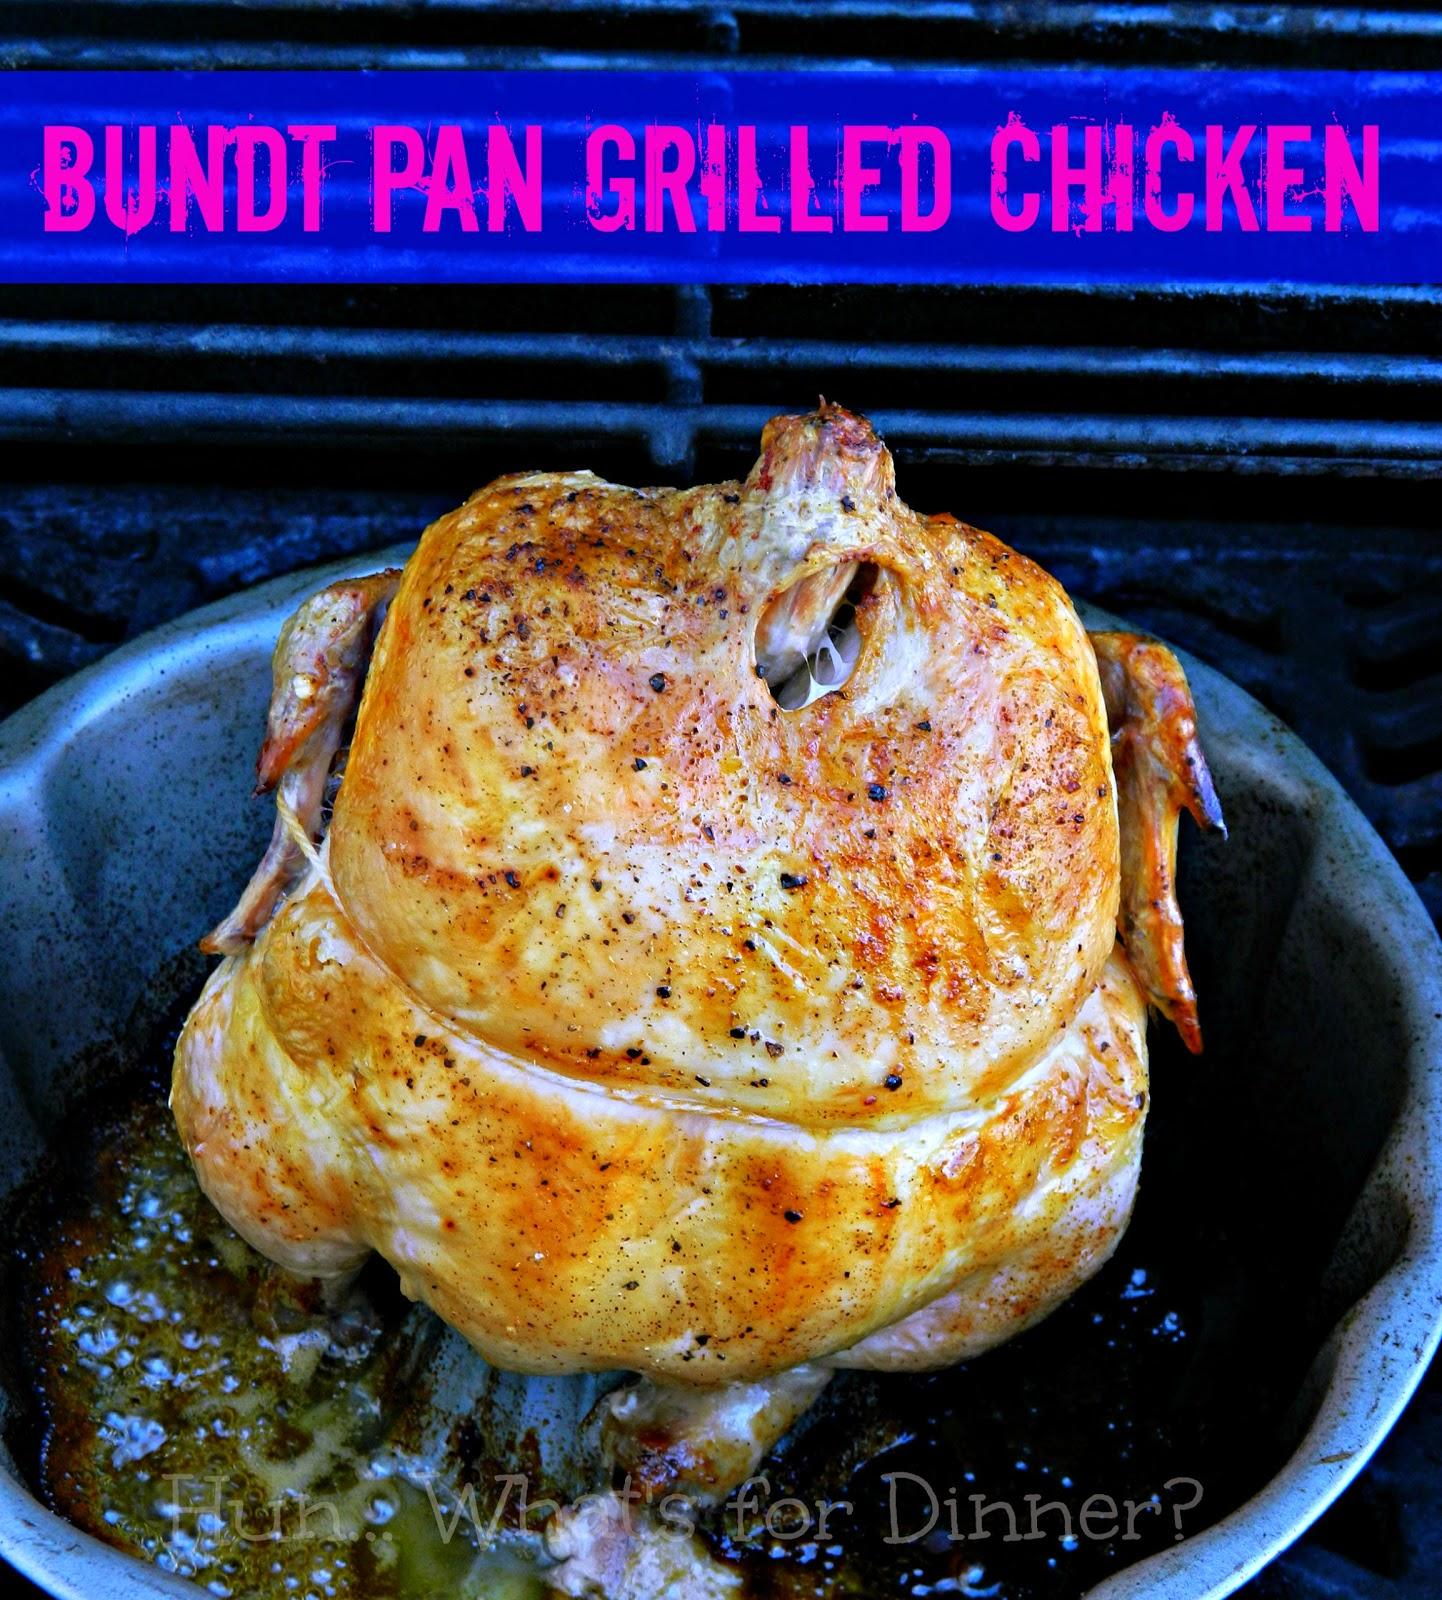 Grilled Bundt Pan Chicken- www.hunwhatsfordinner.com